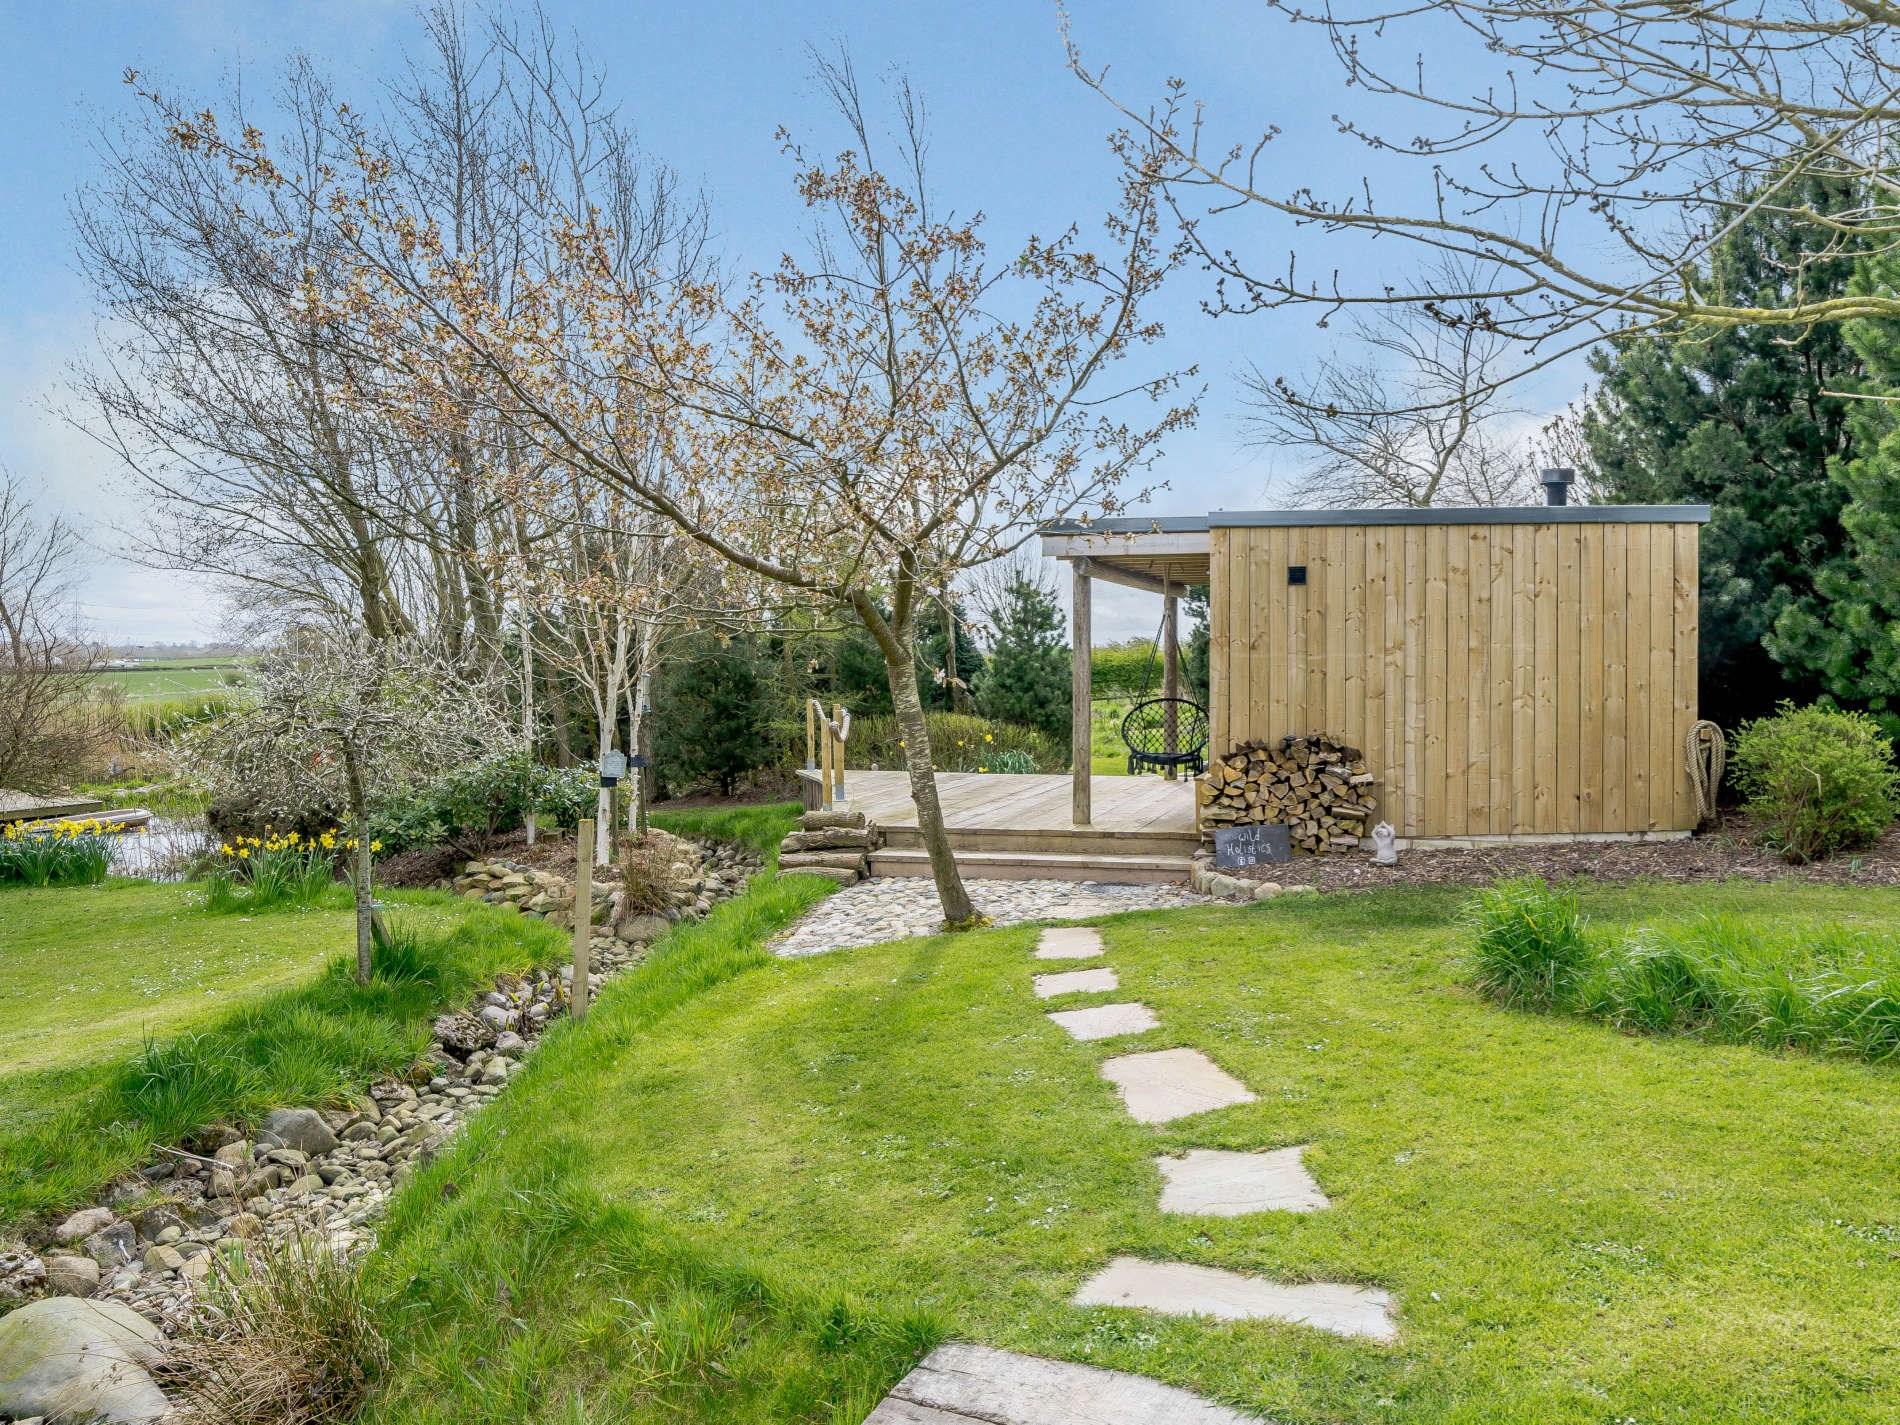 3 Bedroom Barn in Lancashire, Yorkshire Dales